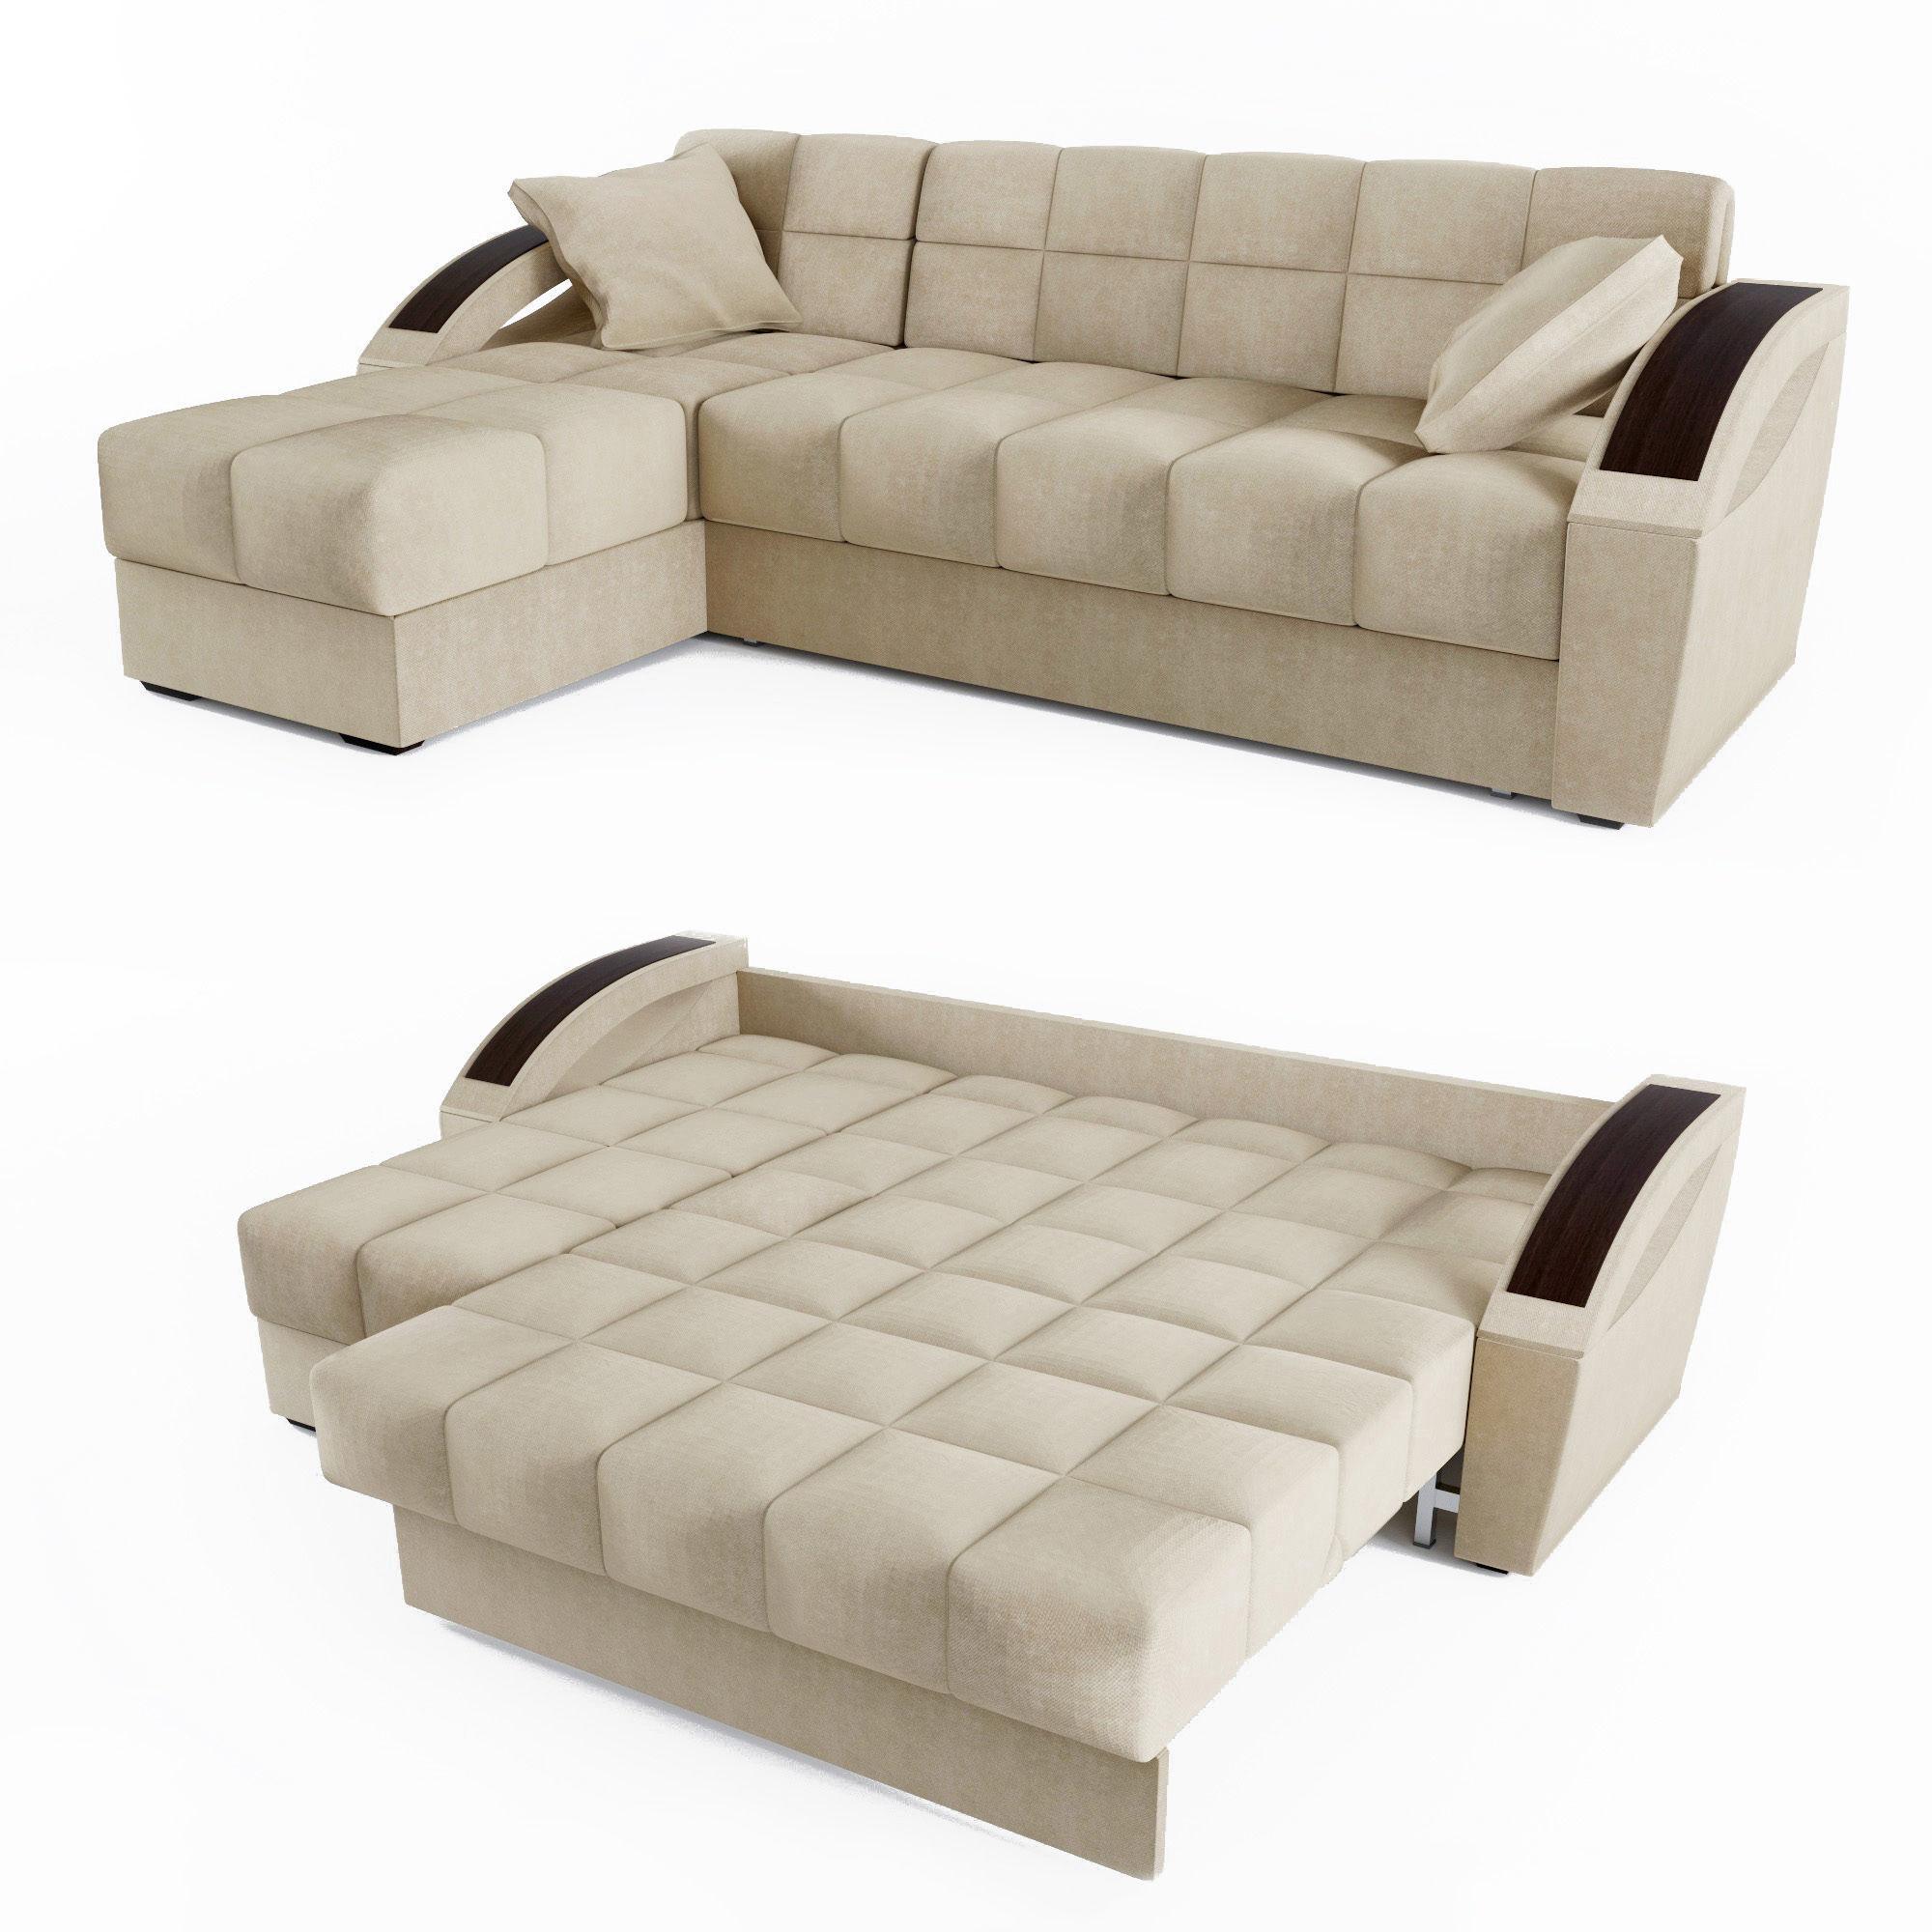 montreal sofa simmons montreal grey convertible sofa si ca. Black Bedroom Furniture Sets. Home Design Ideas